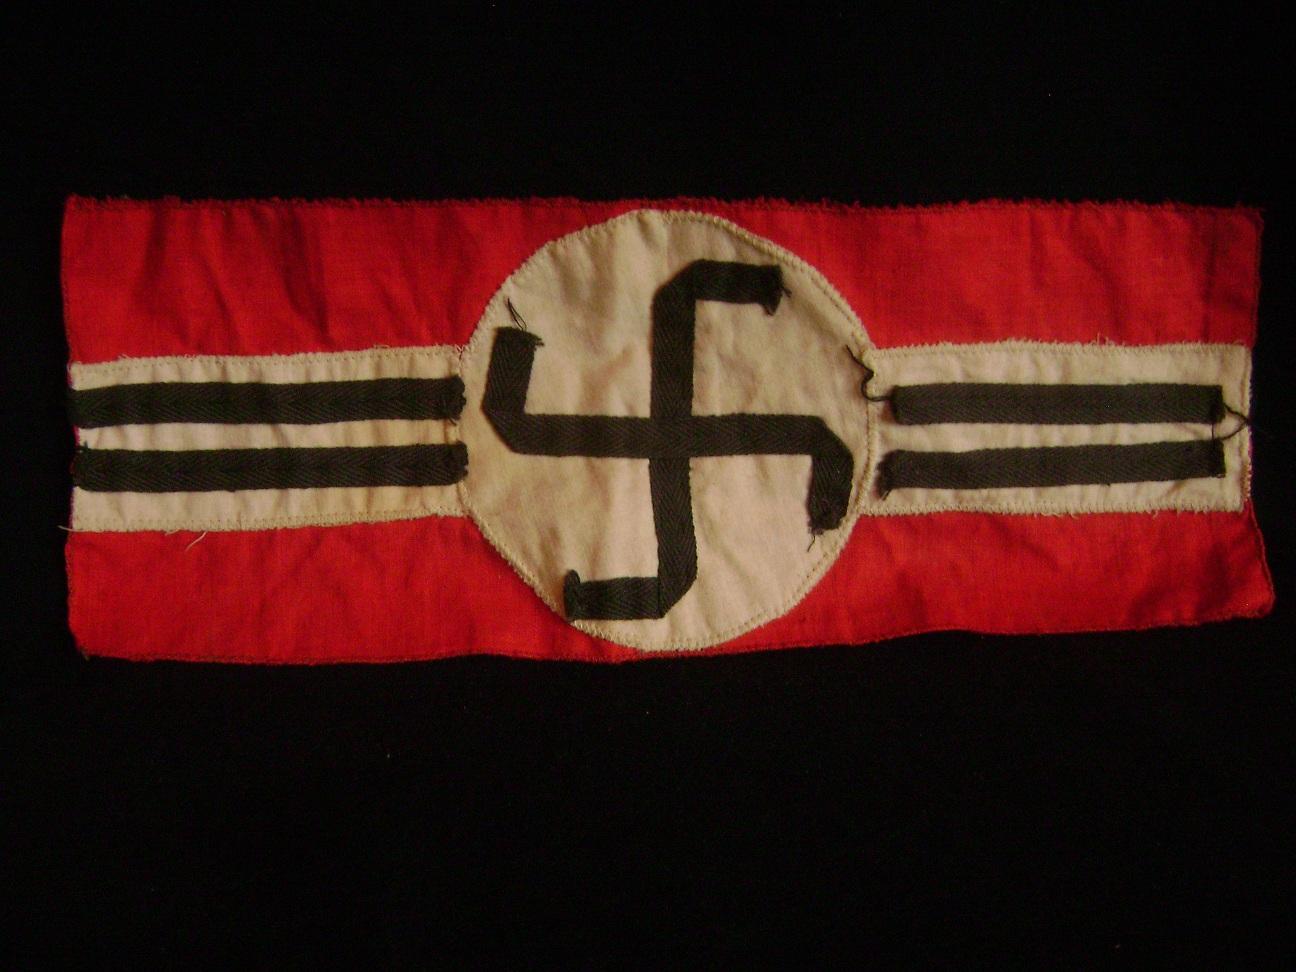 Nemacka_nacisticka_traka_1.JPG